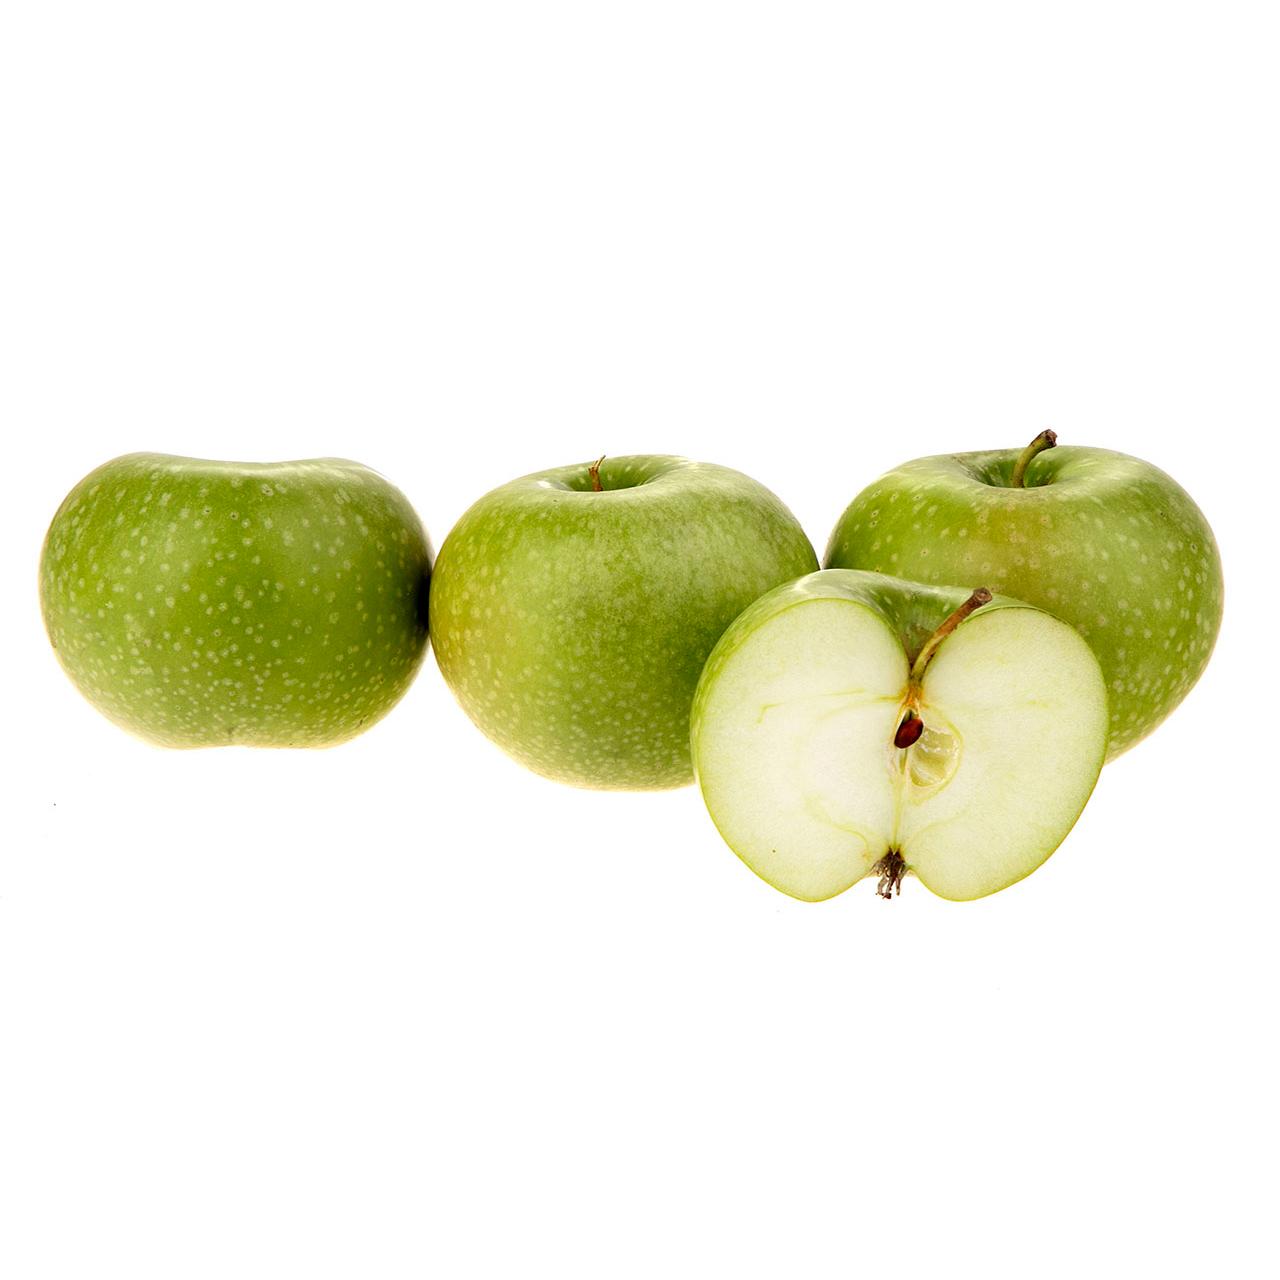 سیب سبز - 1 کیلوگرم (حداقل 3 عدد)